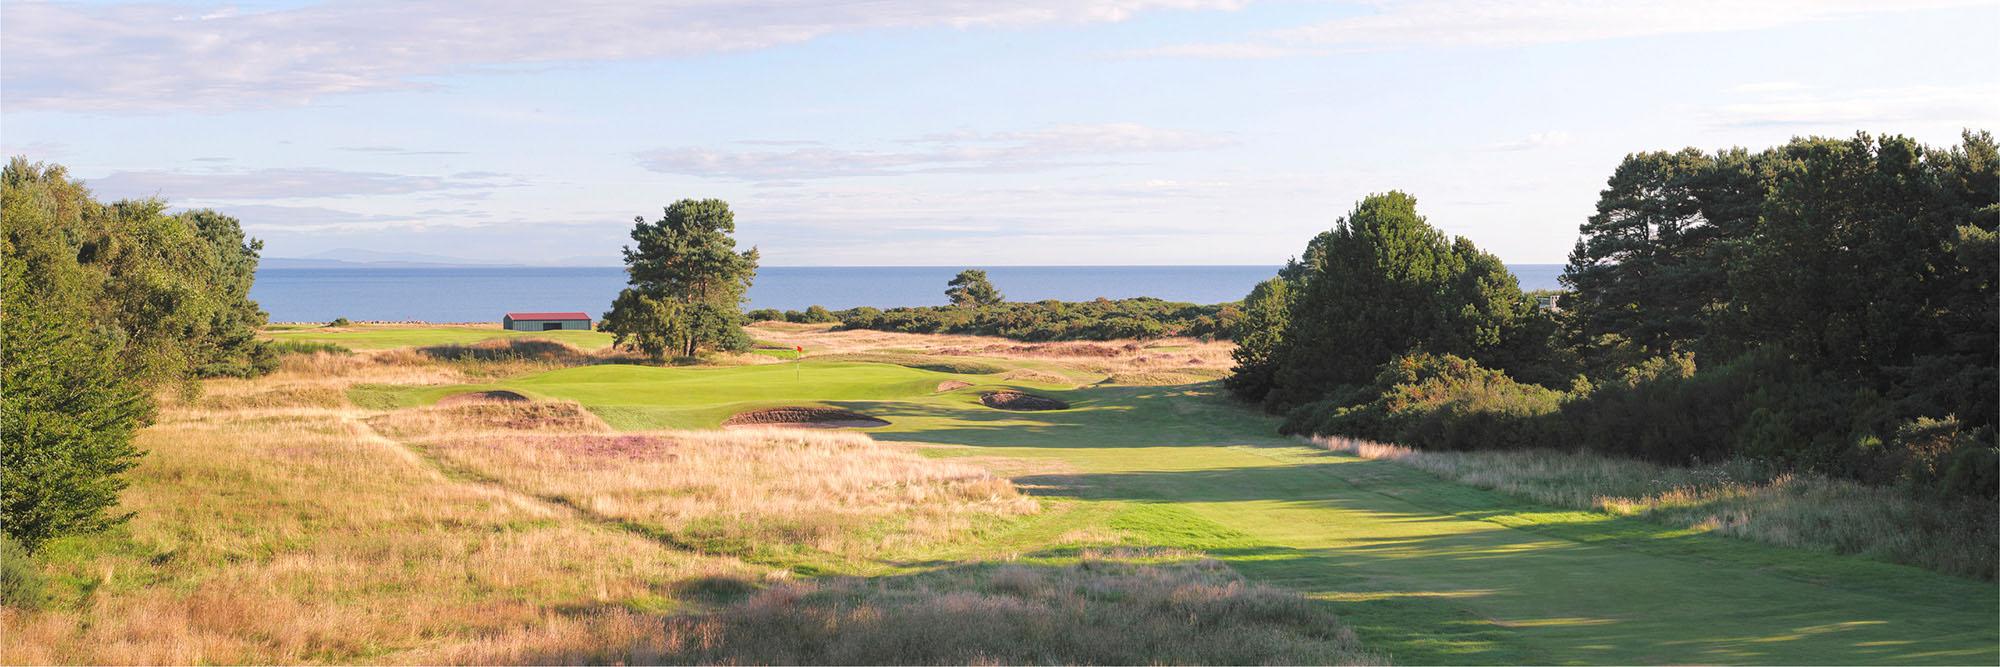 Nairn Golf Club